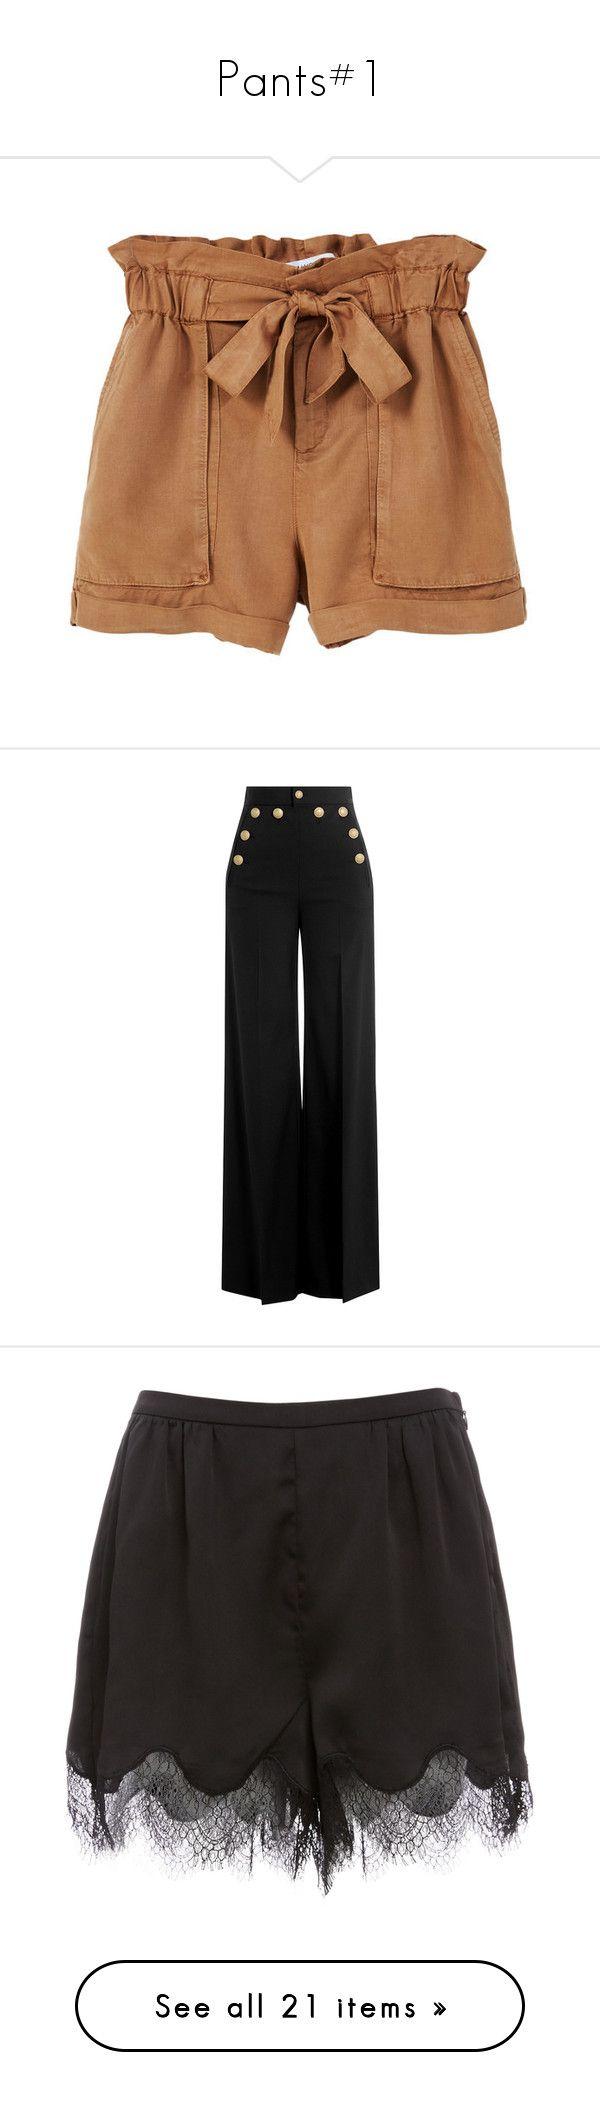 """Pants#1"" by julidrops ❤ liked on Polyvore featuring shorts, bottoms, short, pants, elastic waist shorts, mango shorts, stretch waist shorts, short shorts, elastic waistband shorts and calças"